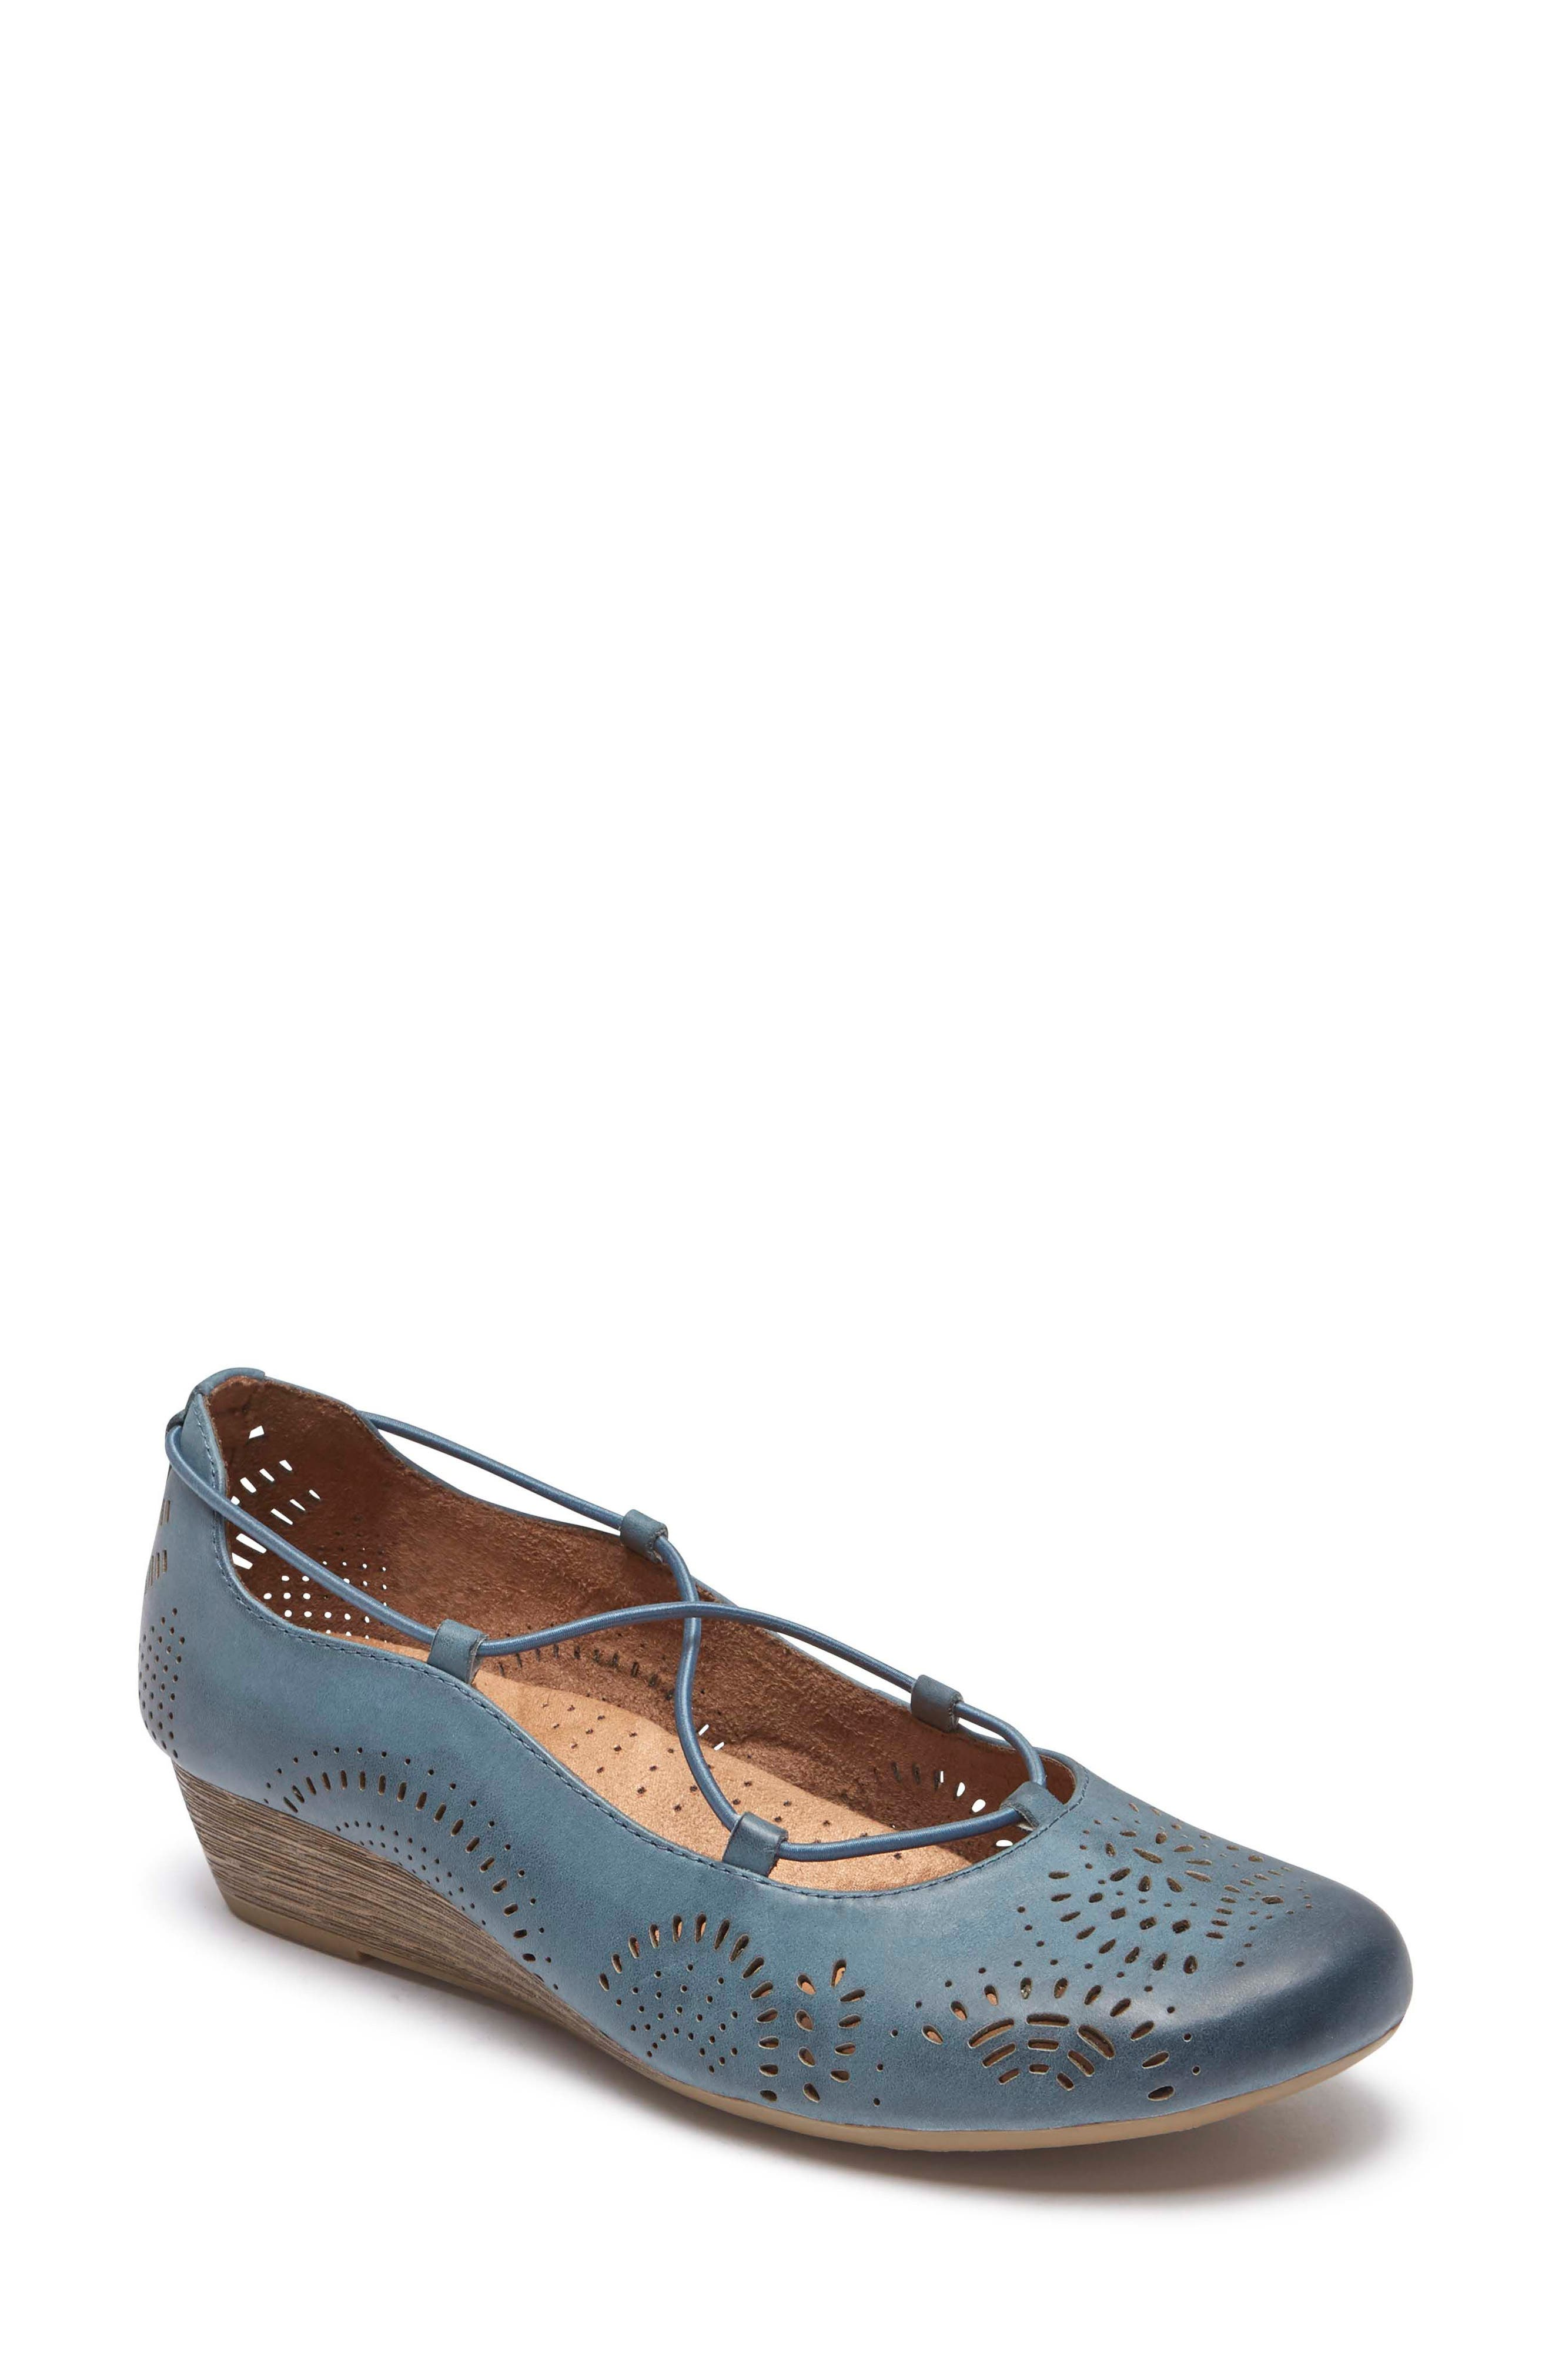 Janna Cross Strap Wedge Sandal,                             Main thumbnail 5, color,